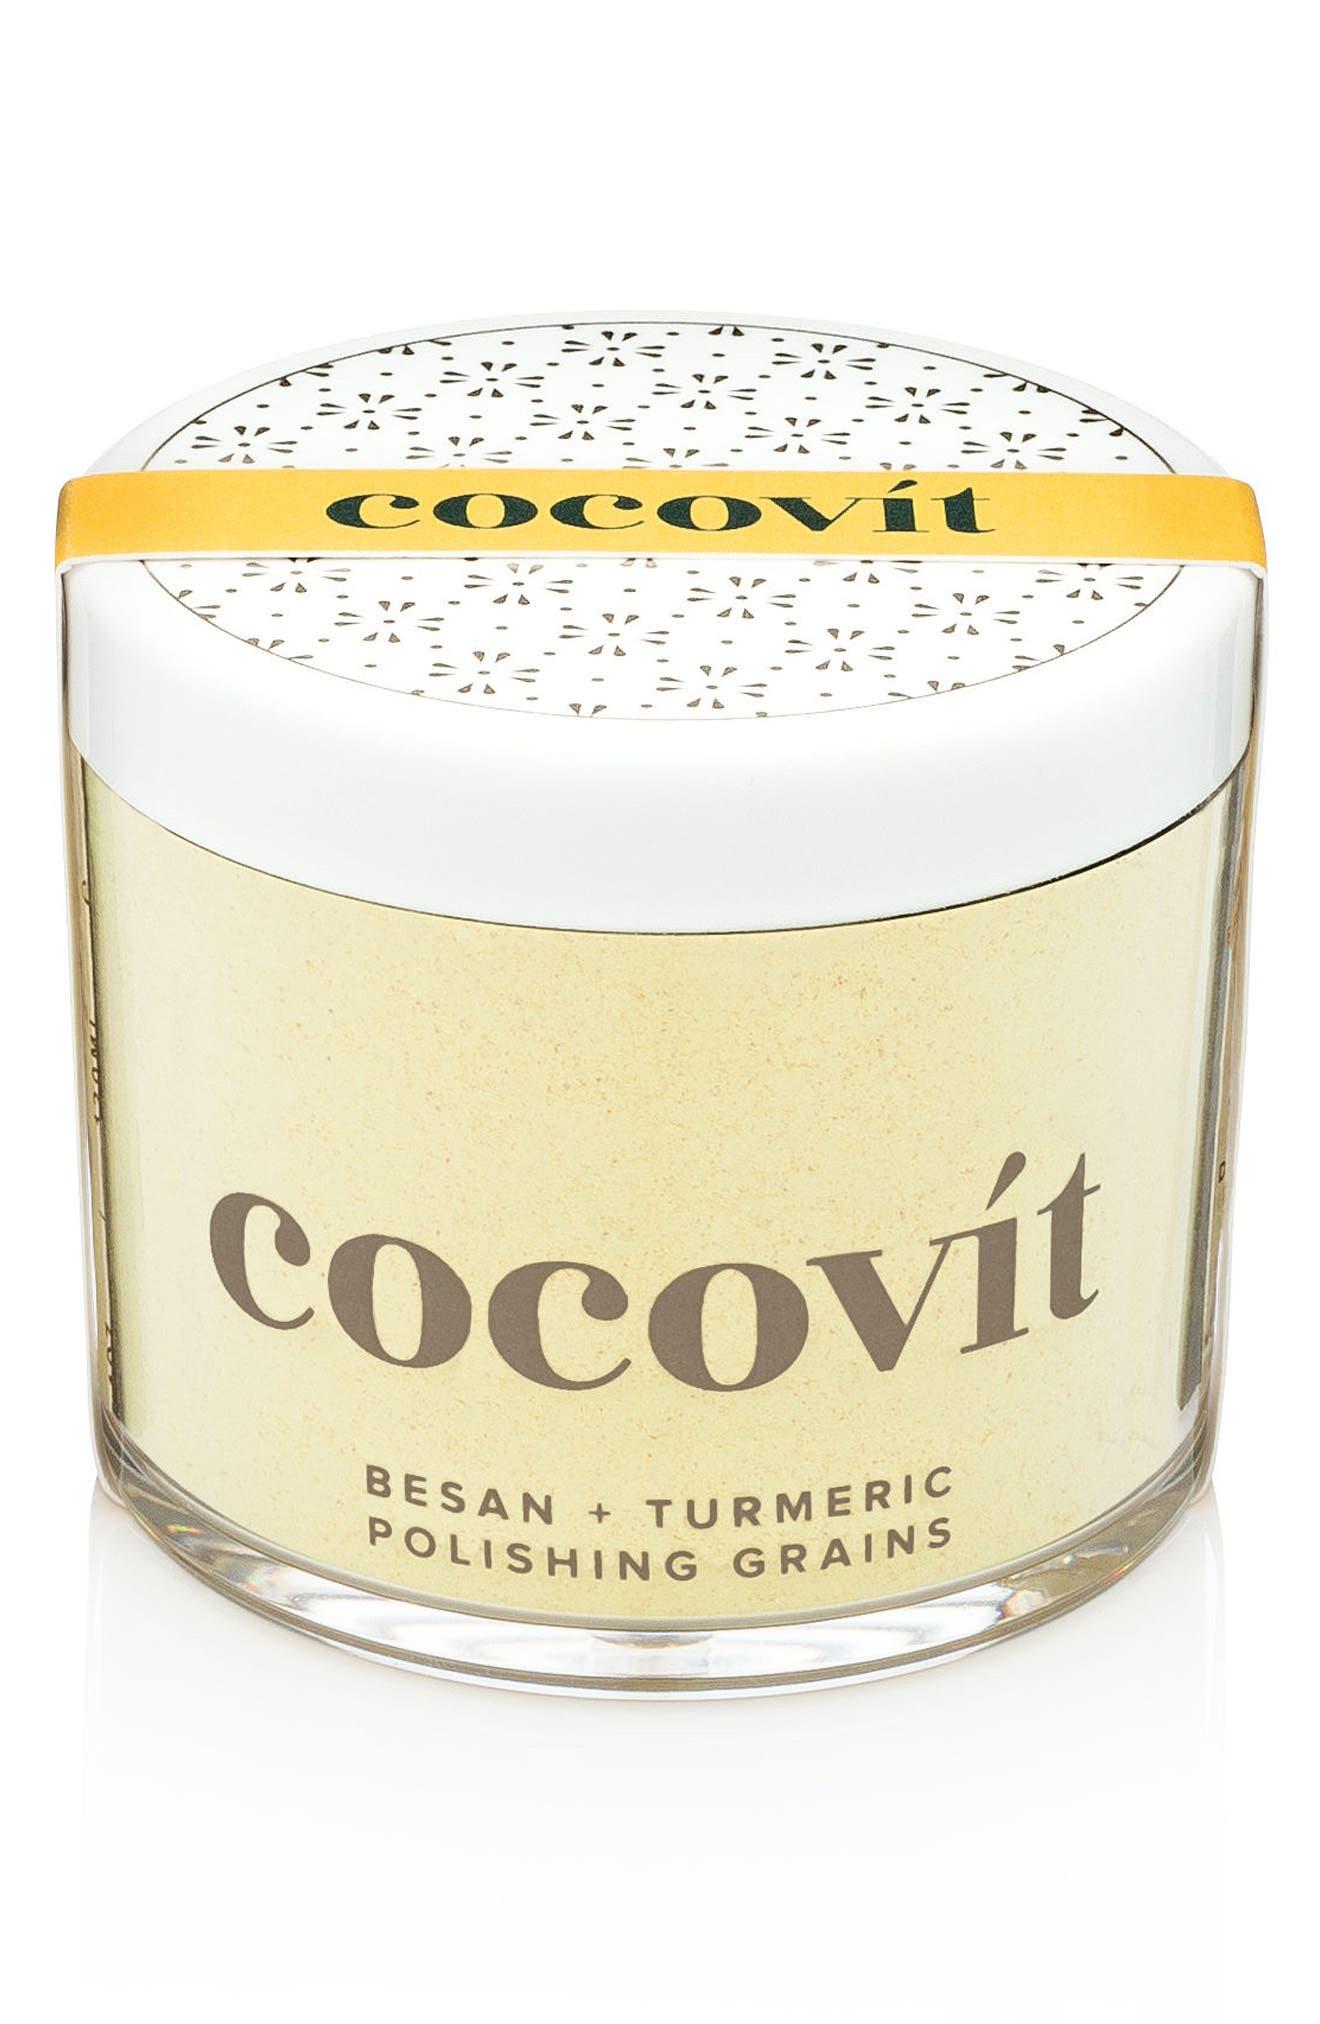 COCOVIT Besan + Turmeric Polishing Grains, Main, color, 000